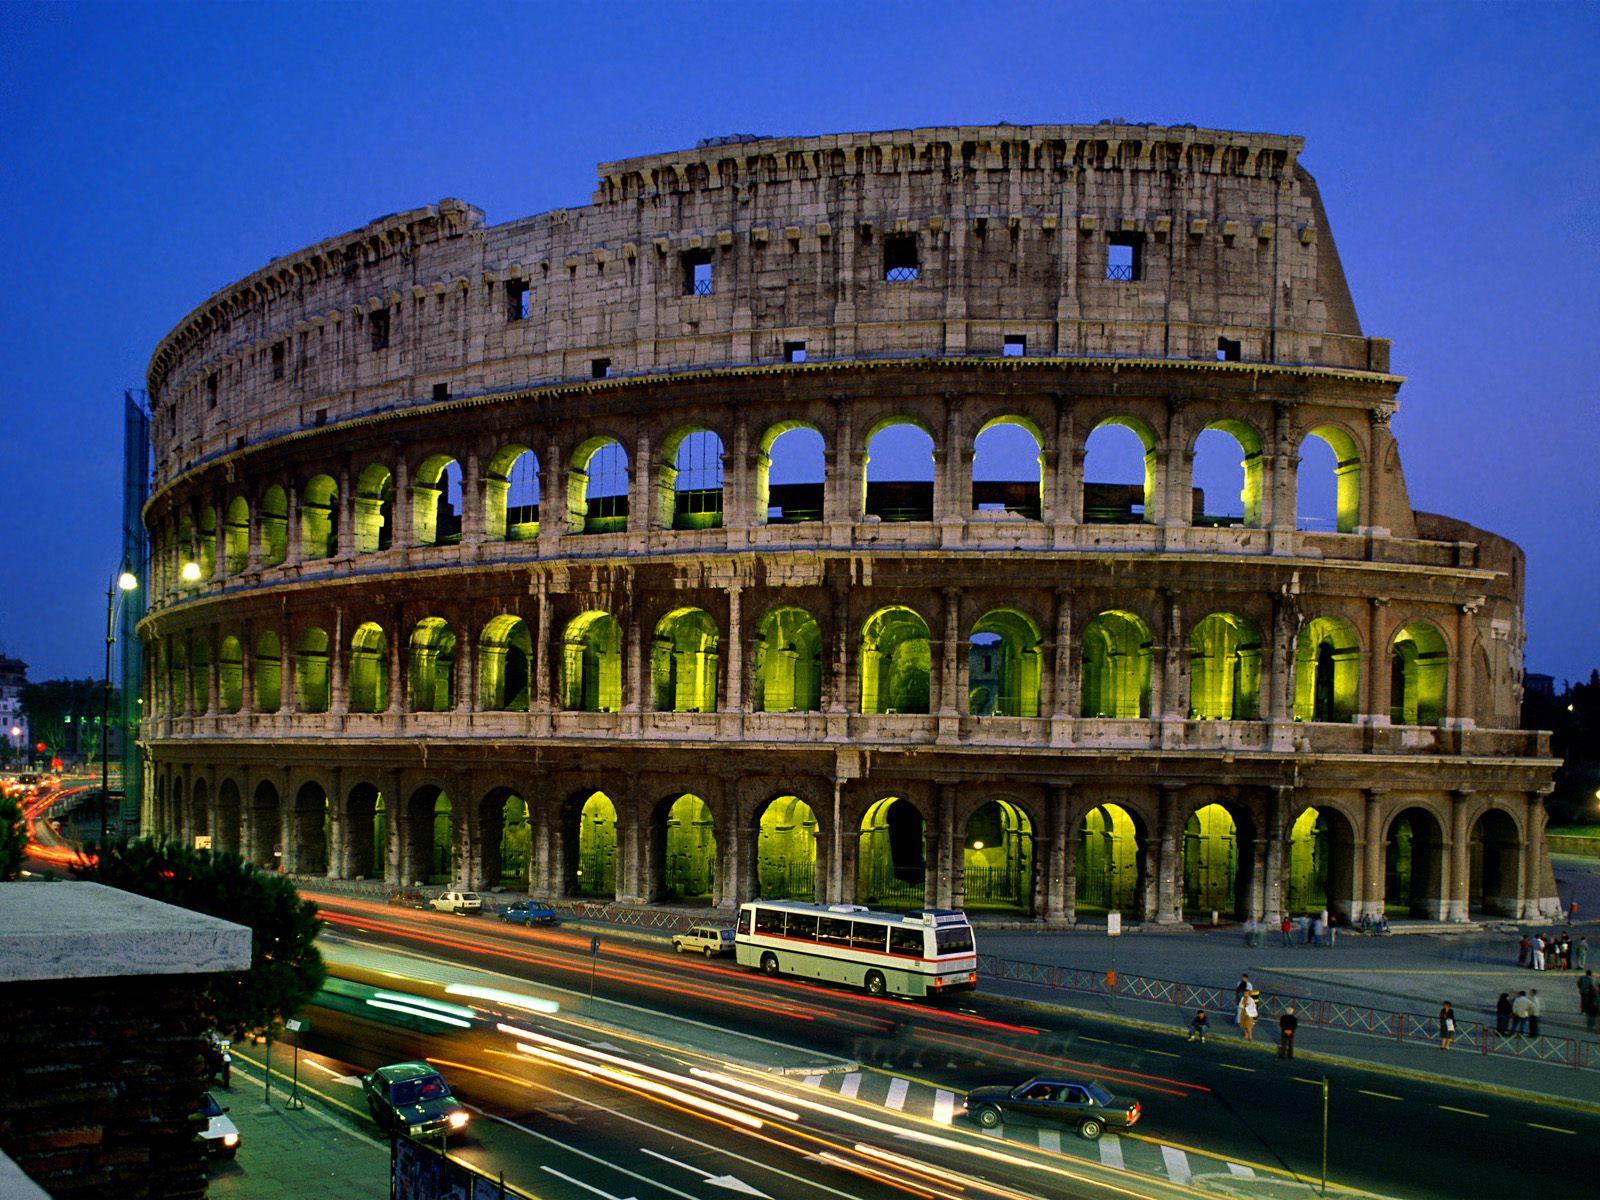 http://4.bp.blogspot.com/_Q2AG-fj5Wbc/TT0bEm5KudI/AAAAAAAAAHU/87qeip5VX6g/s1600/Coliseum_Rome_Italy.jpg